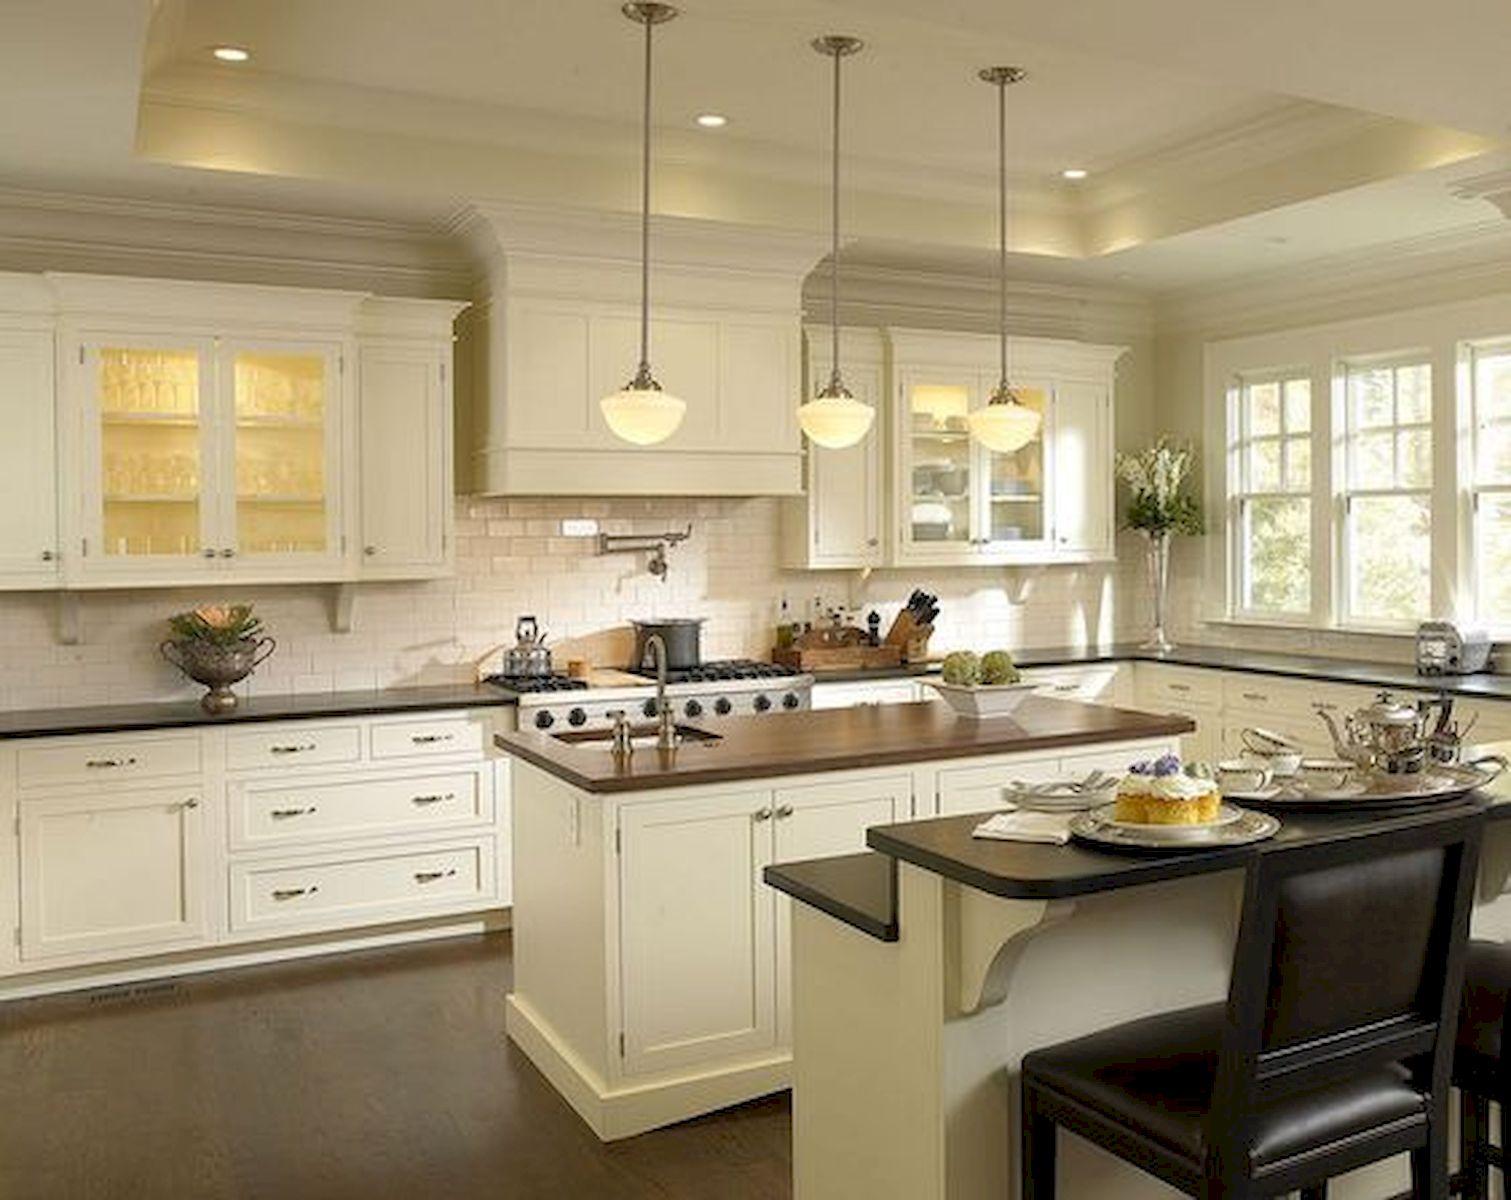 40 Elegant White Kitchen Design And Decor Ideas 7